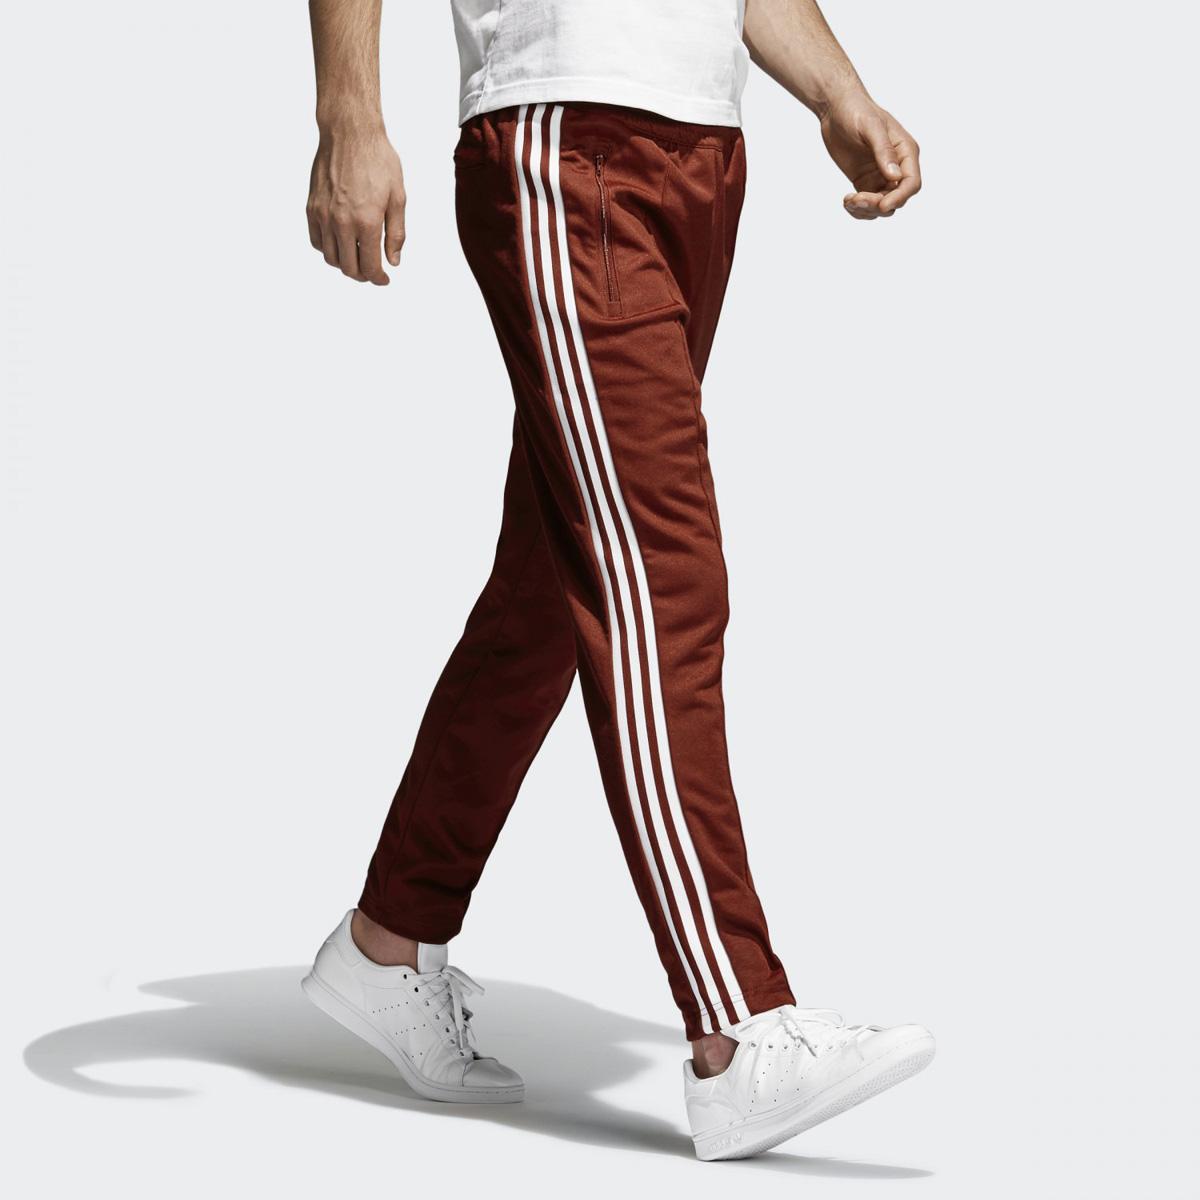 b60bc11c752d adidas Originals BECKENBAUER TRACK PANTS (Adidas originals Beckenbauer  trackpants) Rust Red 18SP-I